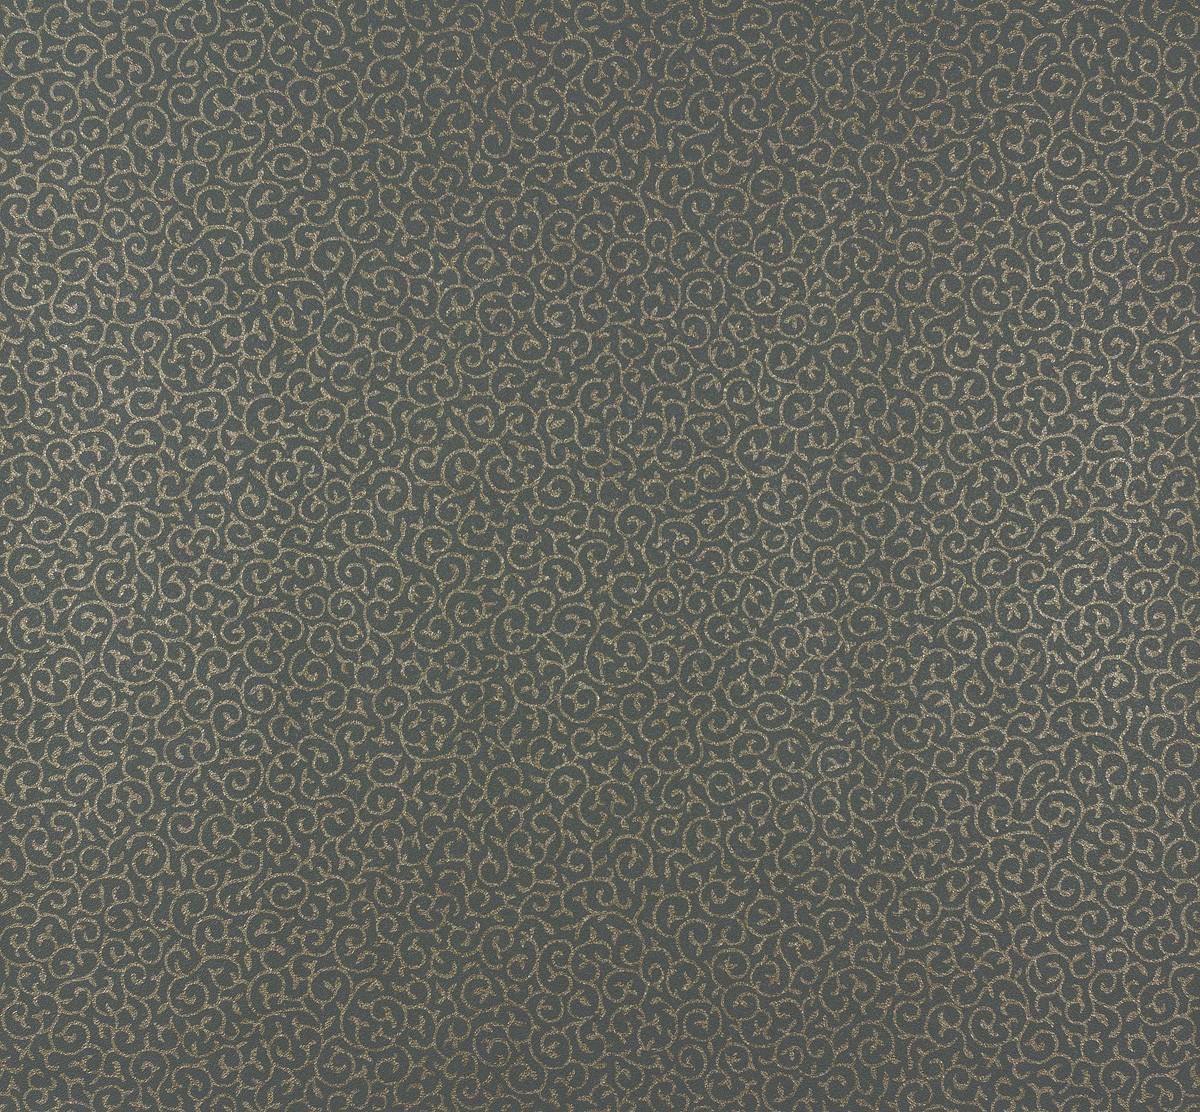 Vliestapete marburg messina tapete 55441 design grau gold for Design tapete grau